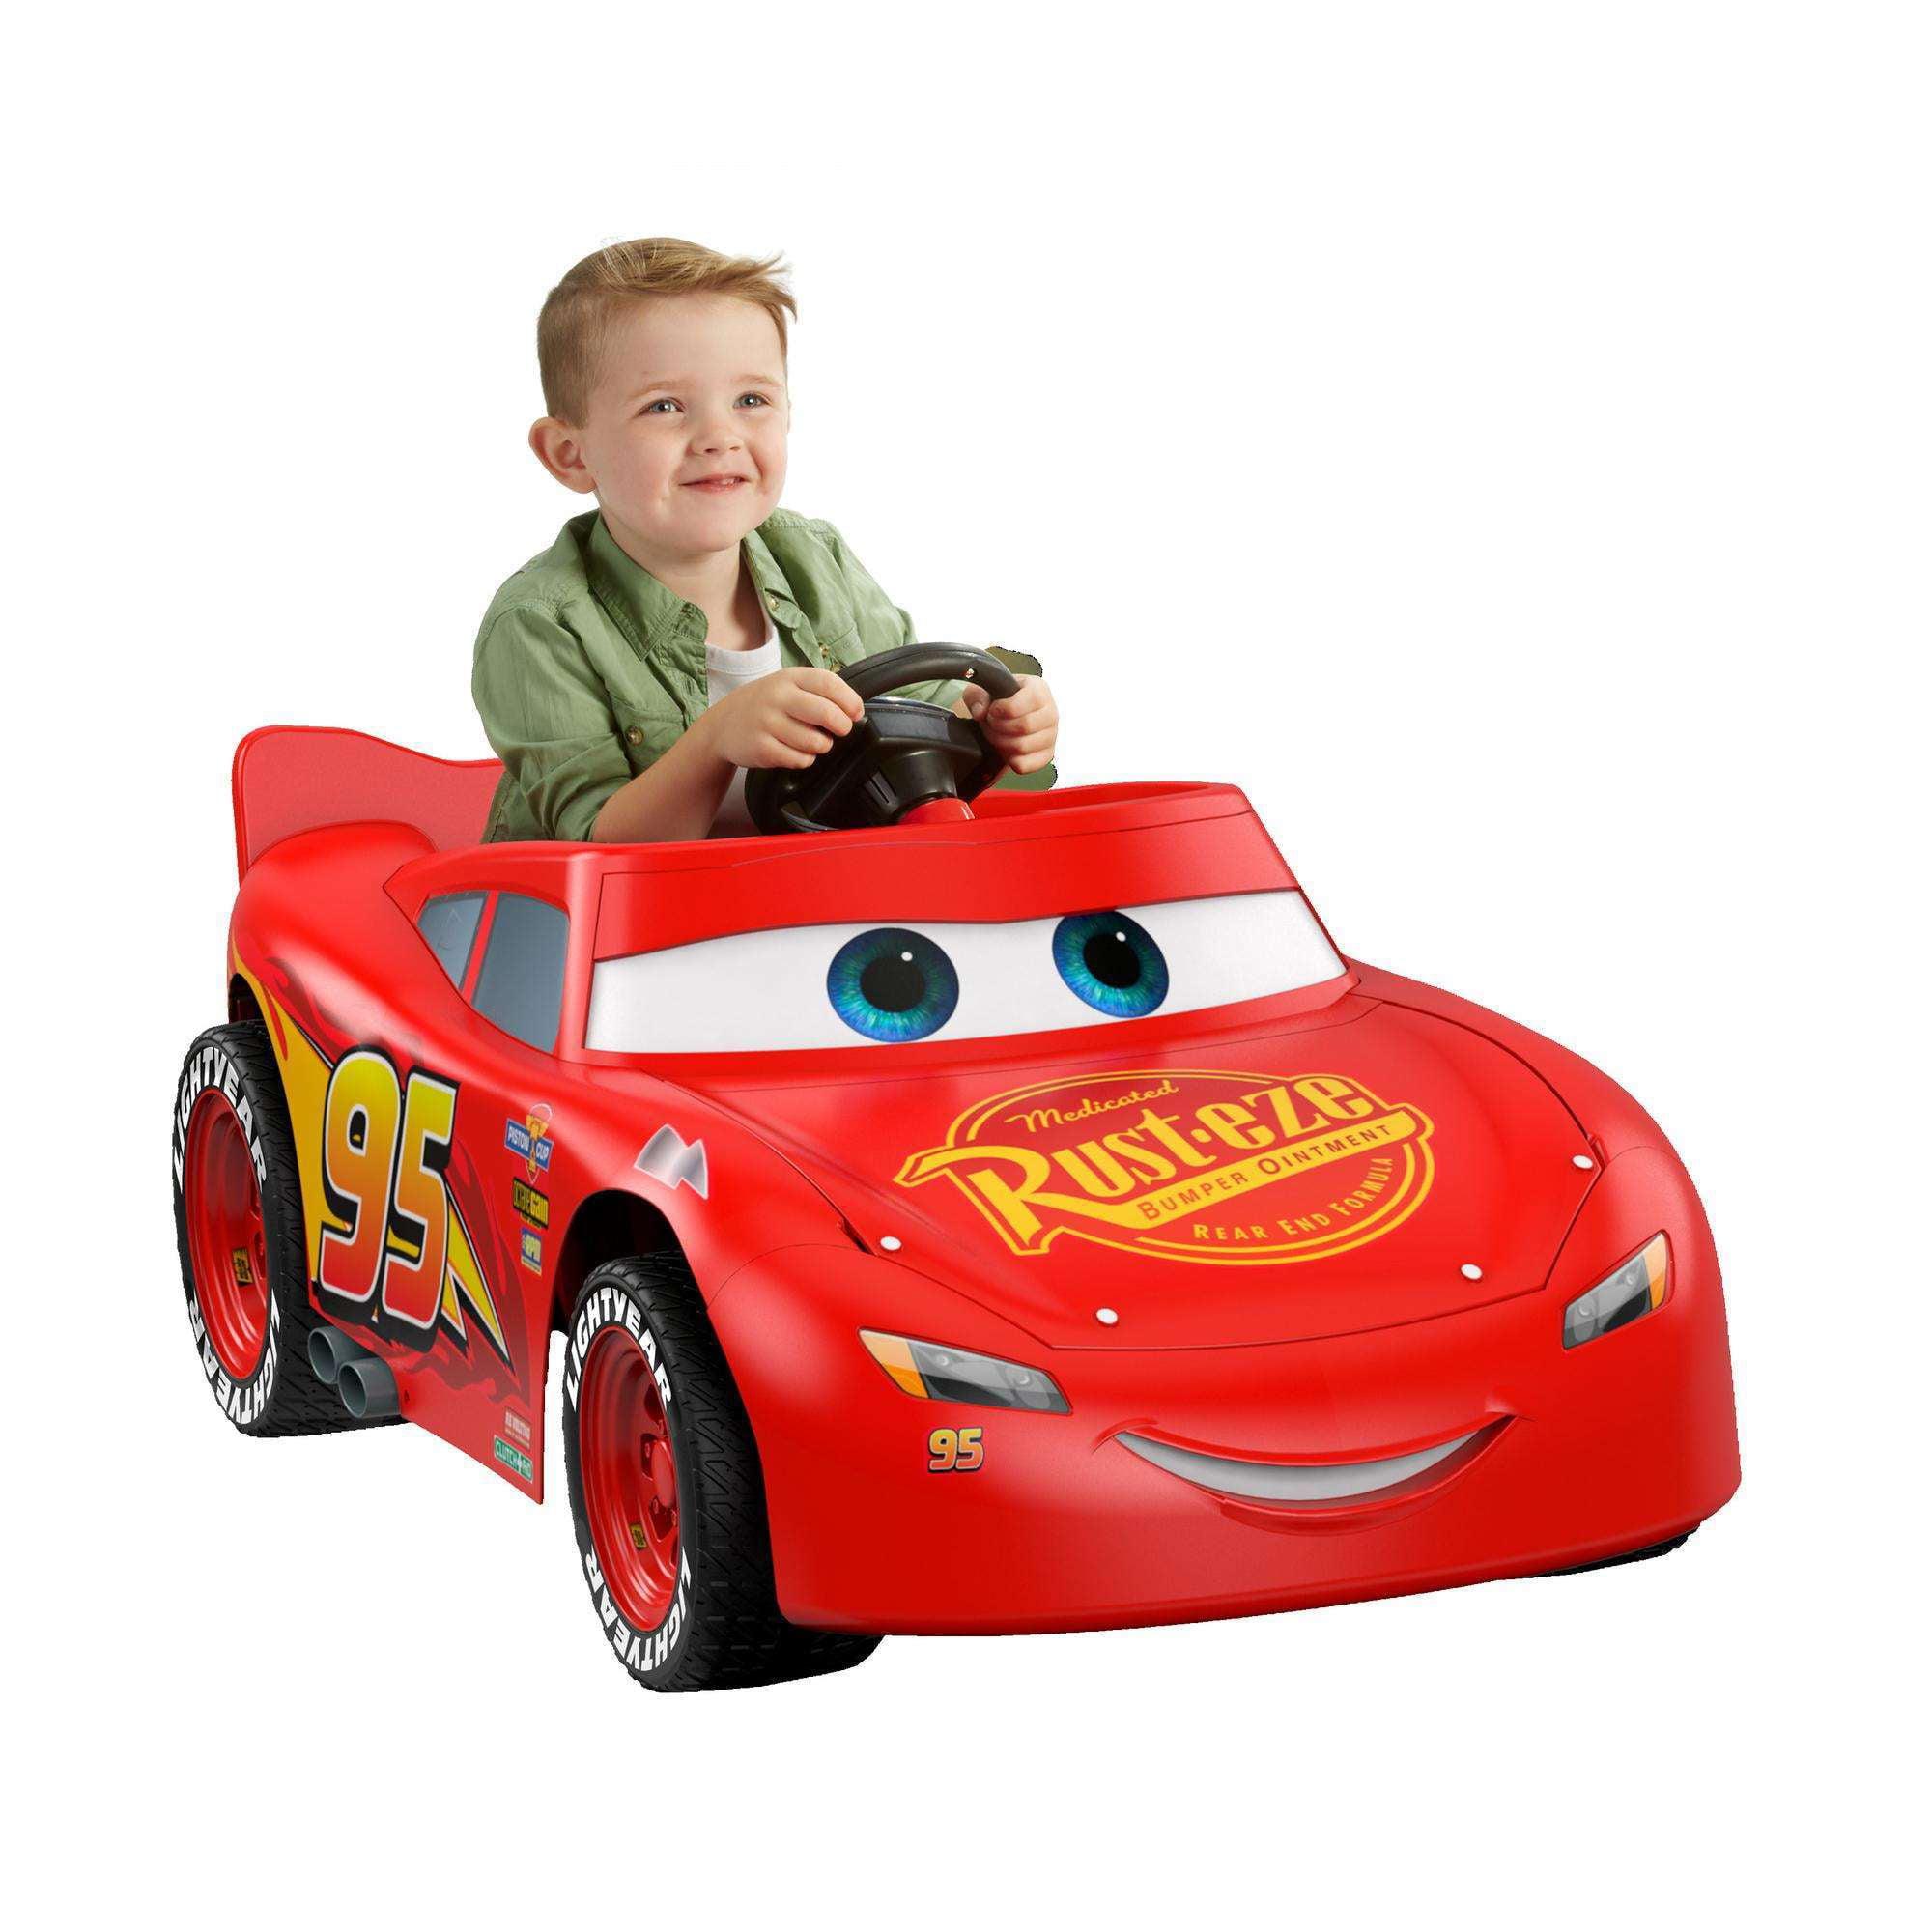 Power Wheels Disney Pixar Cars 3 Lightning McQueen by FISHER PRICE